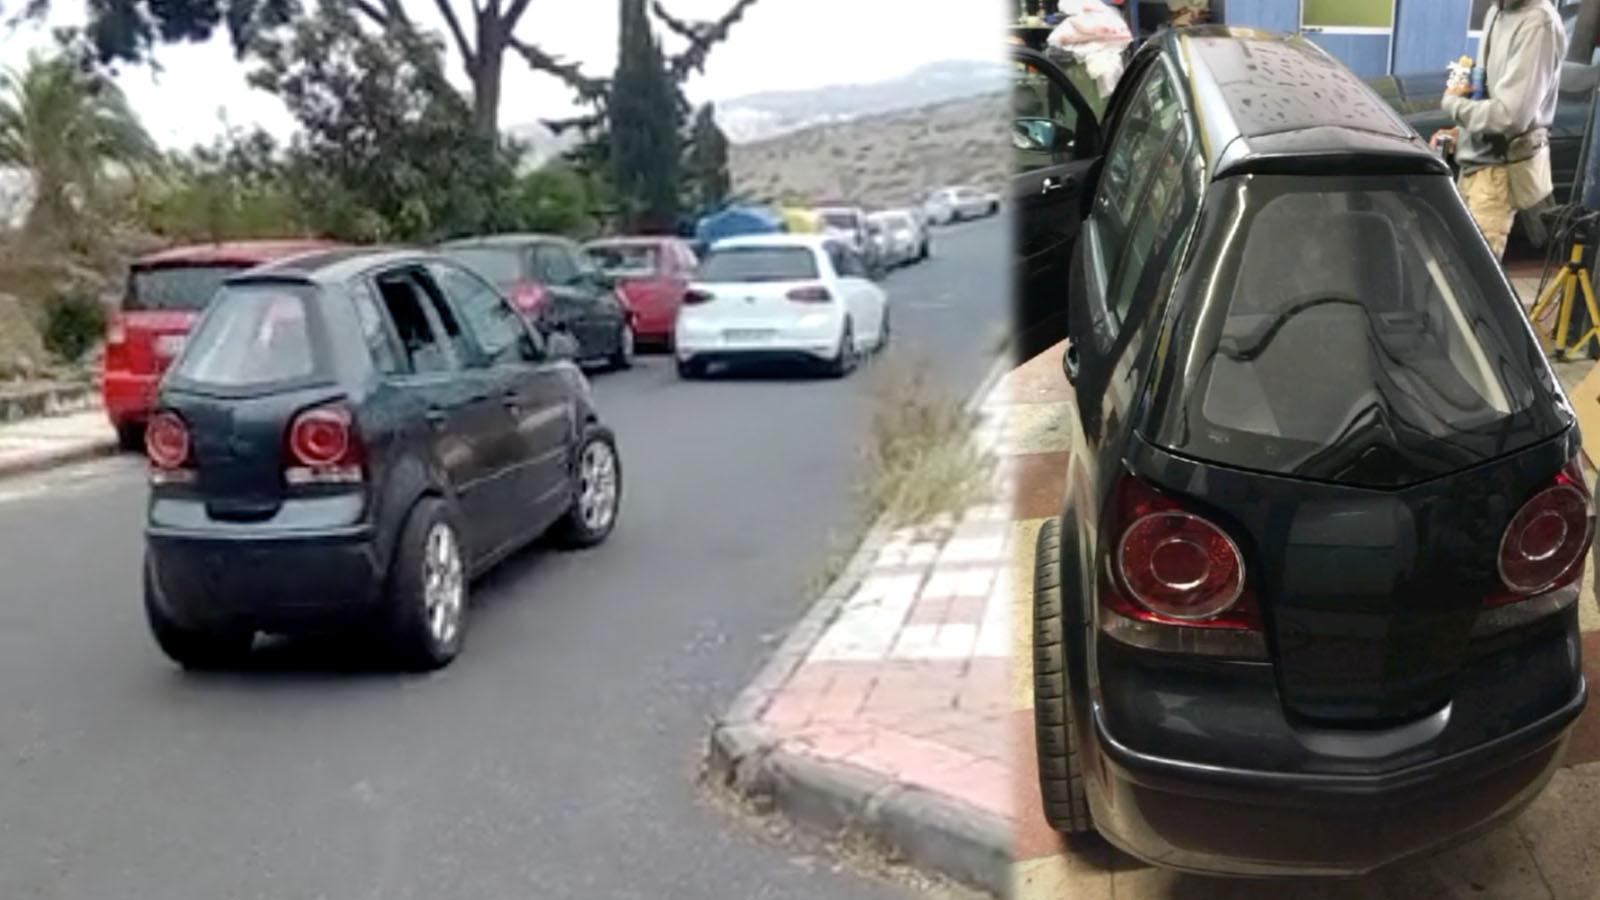 Thinny Car on street